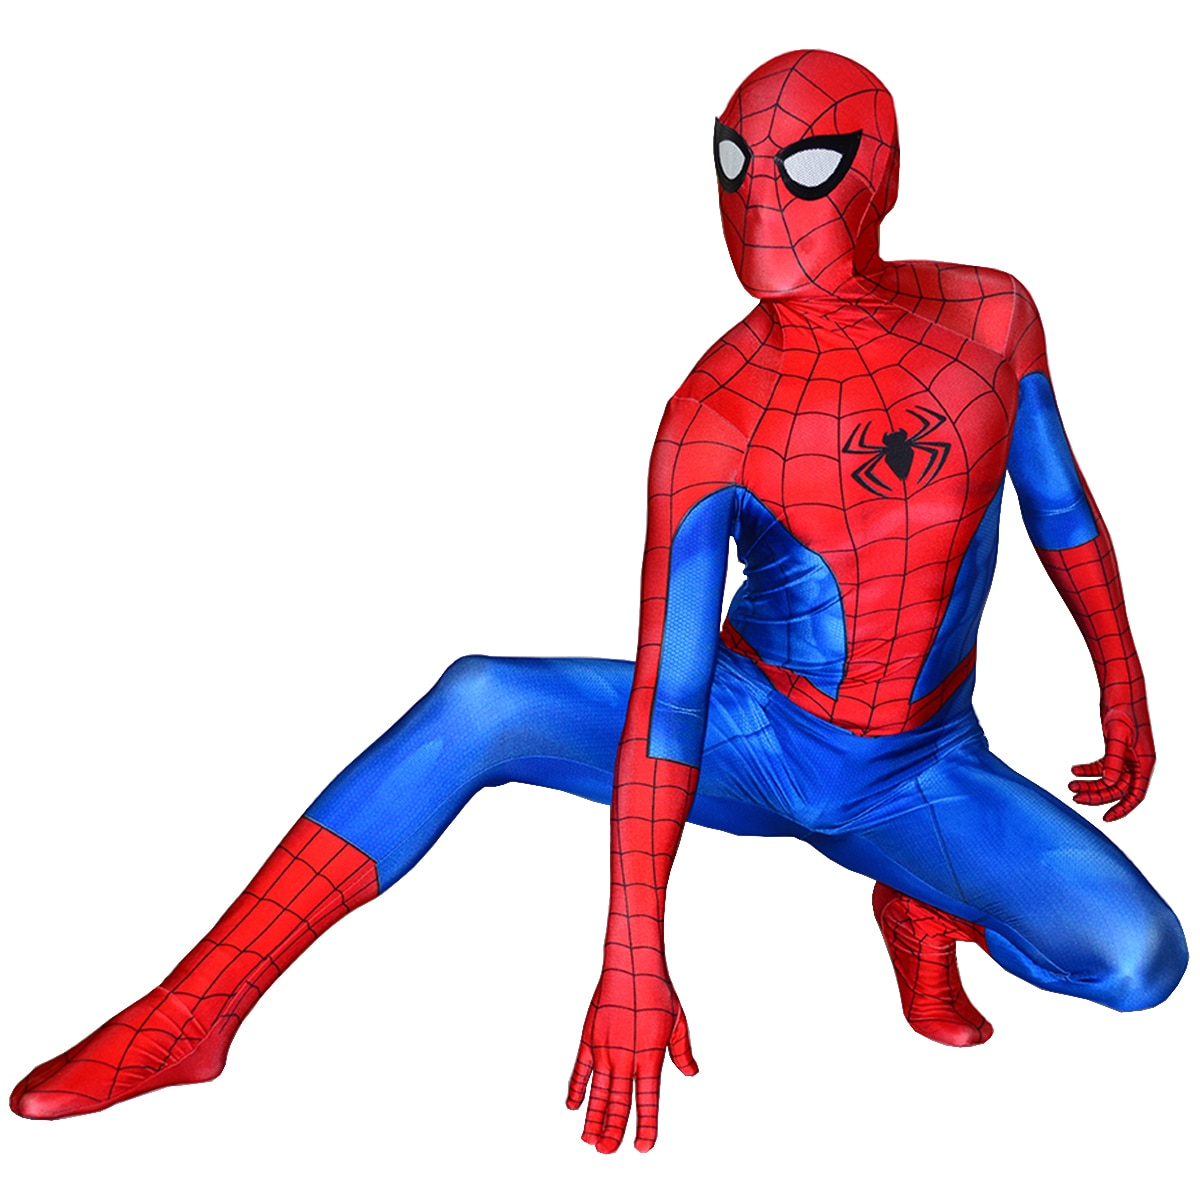 Novo ps4 spiderman traje elastano impresso ps4 clássico homem-aranha super-herói cosplay zentai terno festa de halloween bodysuit